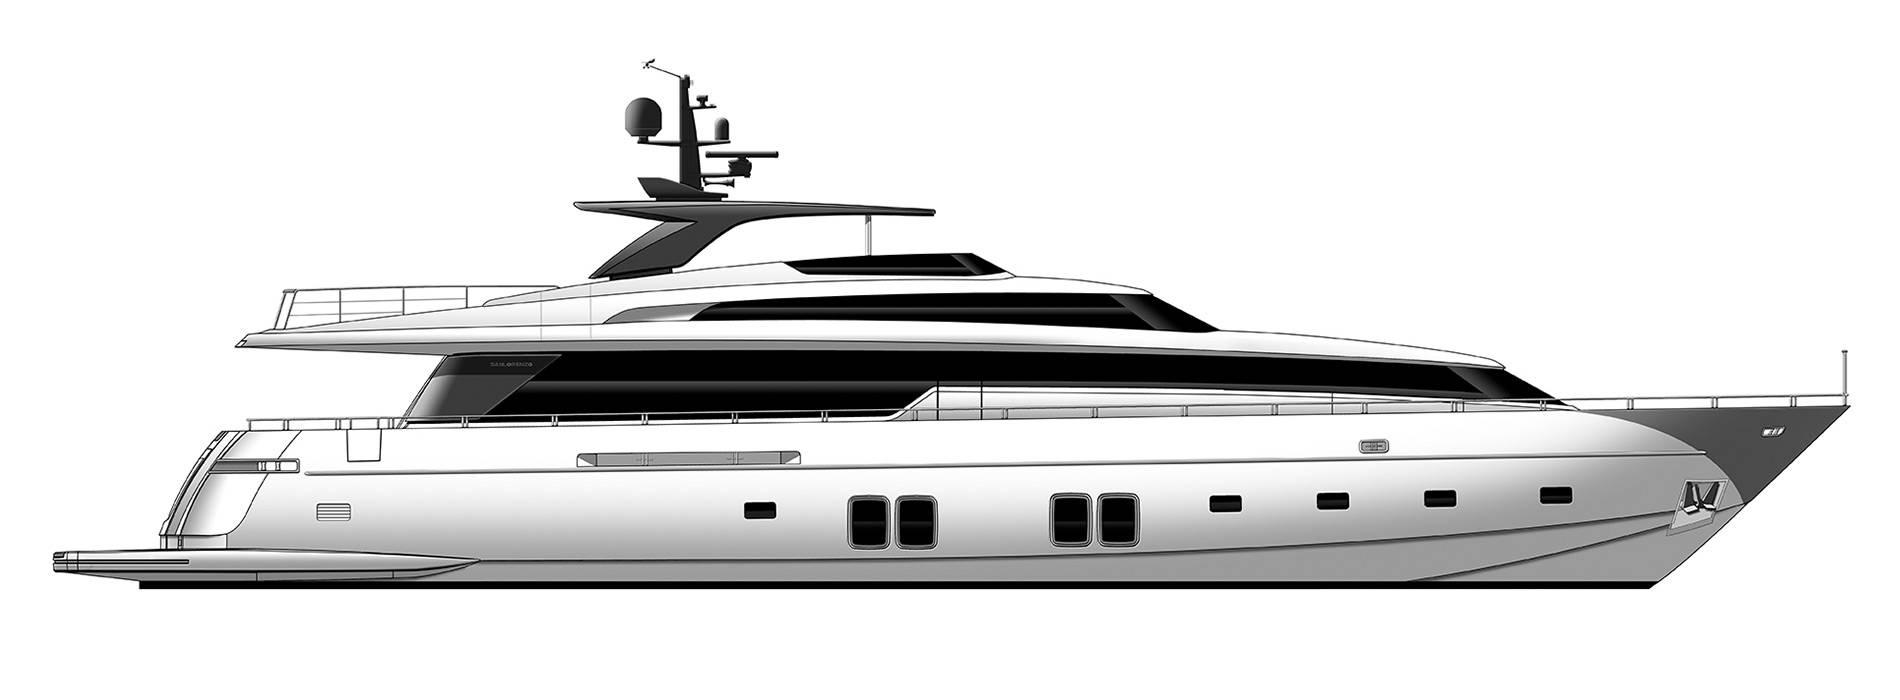 Sanlorenzo Yachts SL106 Profile